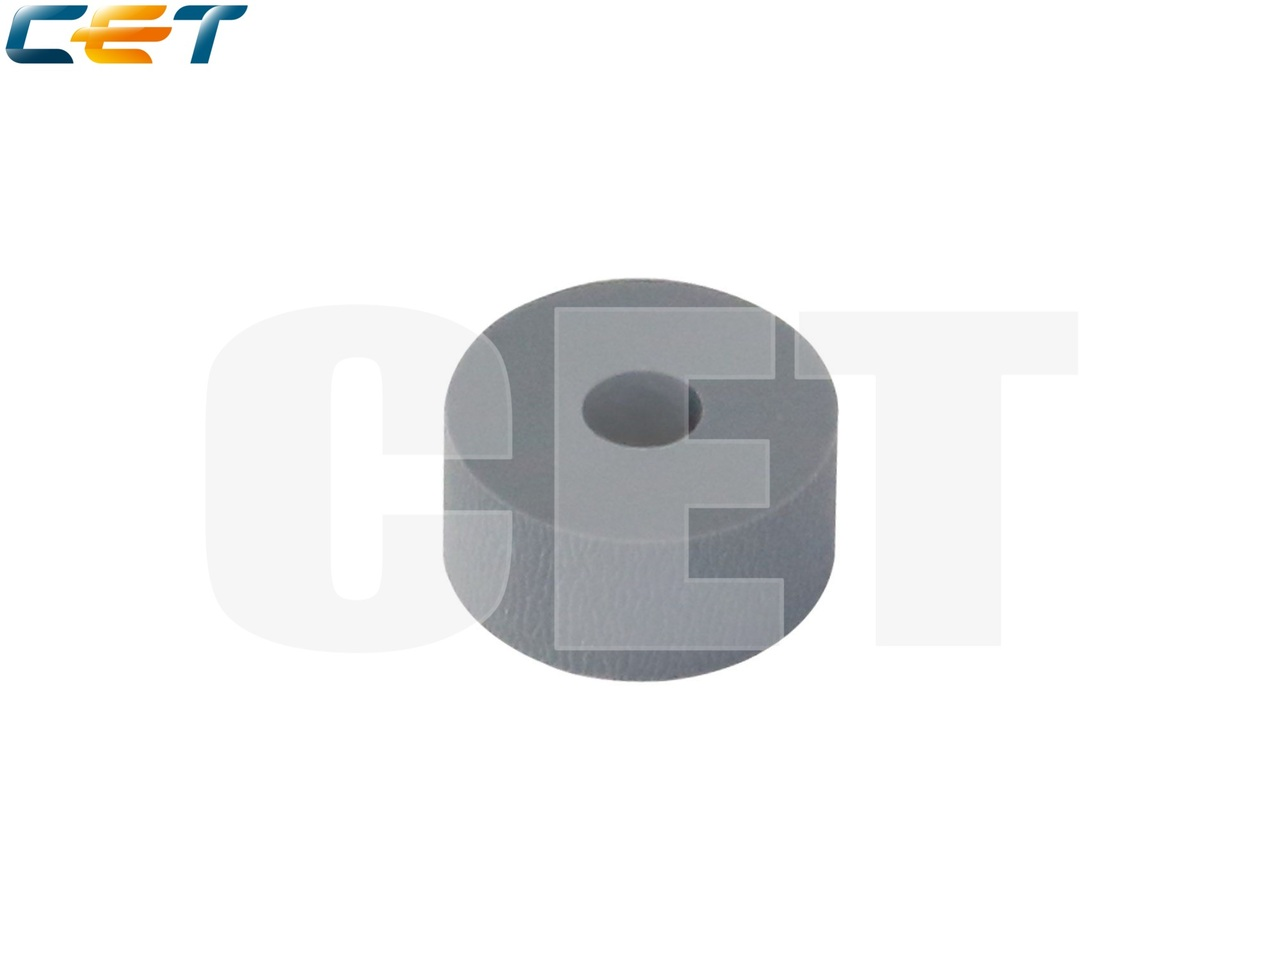 Резинка ролика подхвата, нижняя PA03338-K011-Lower дляFUJITSU fi-6670/6770 (CET), CET341016